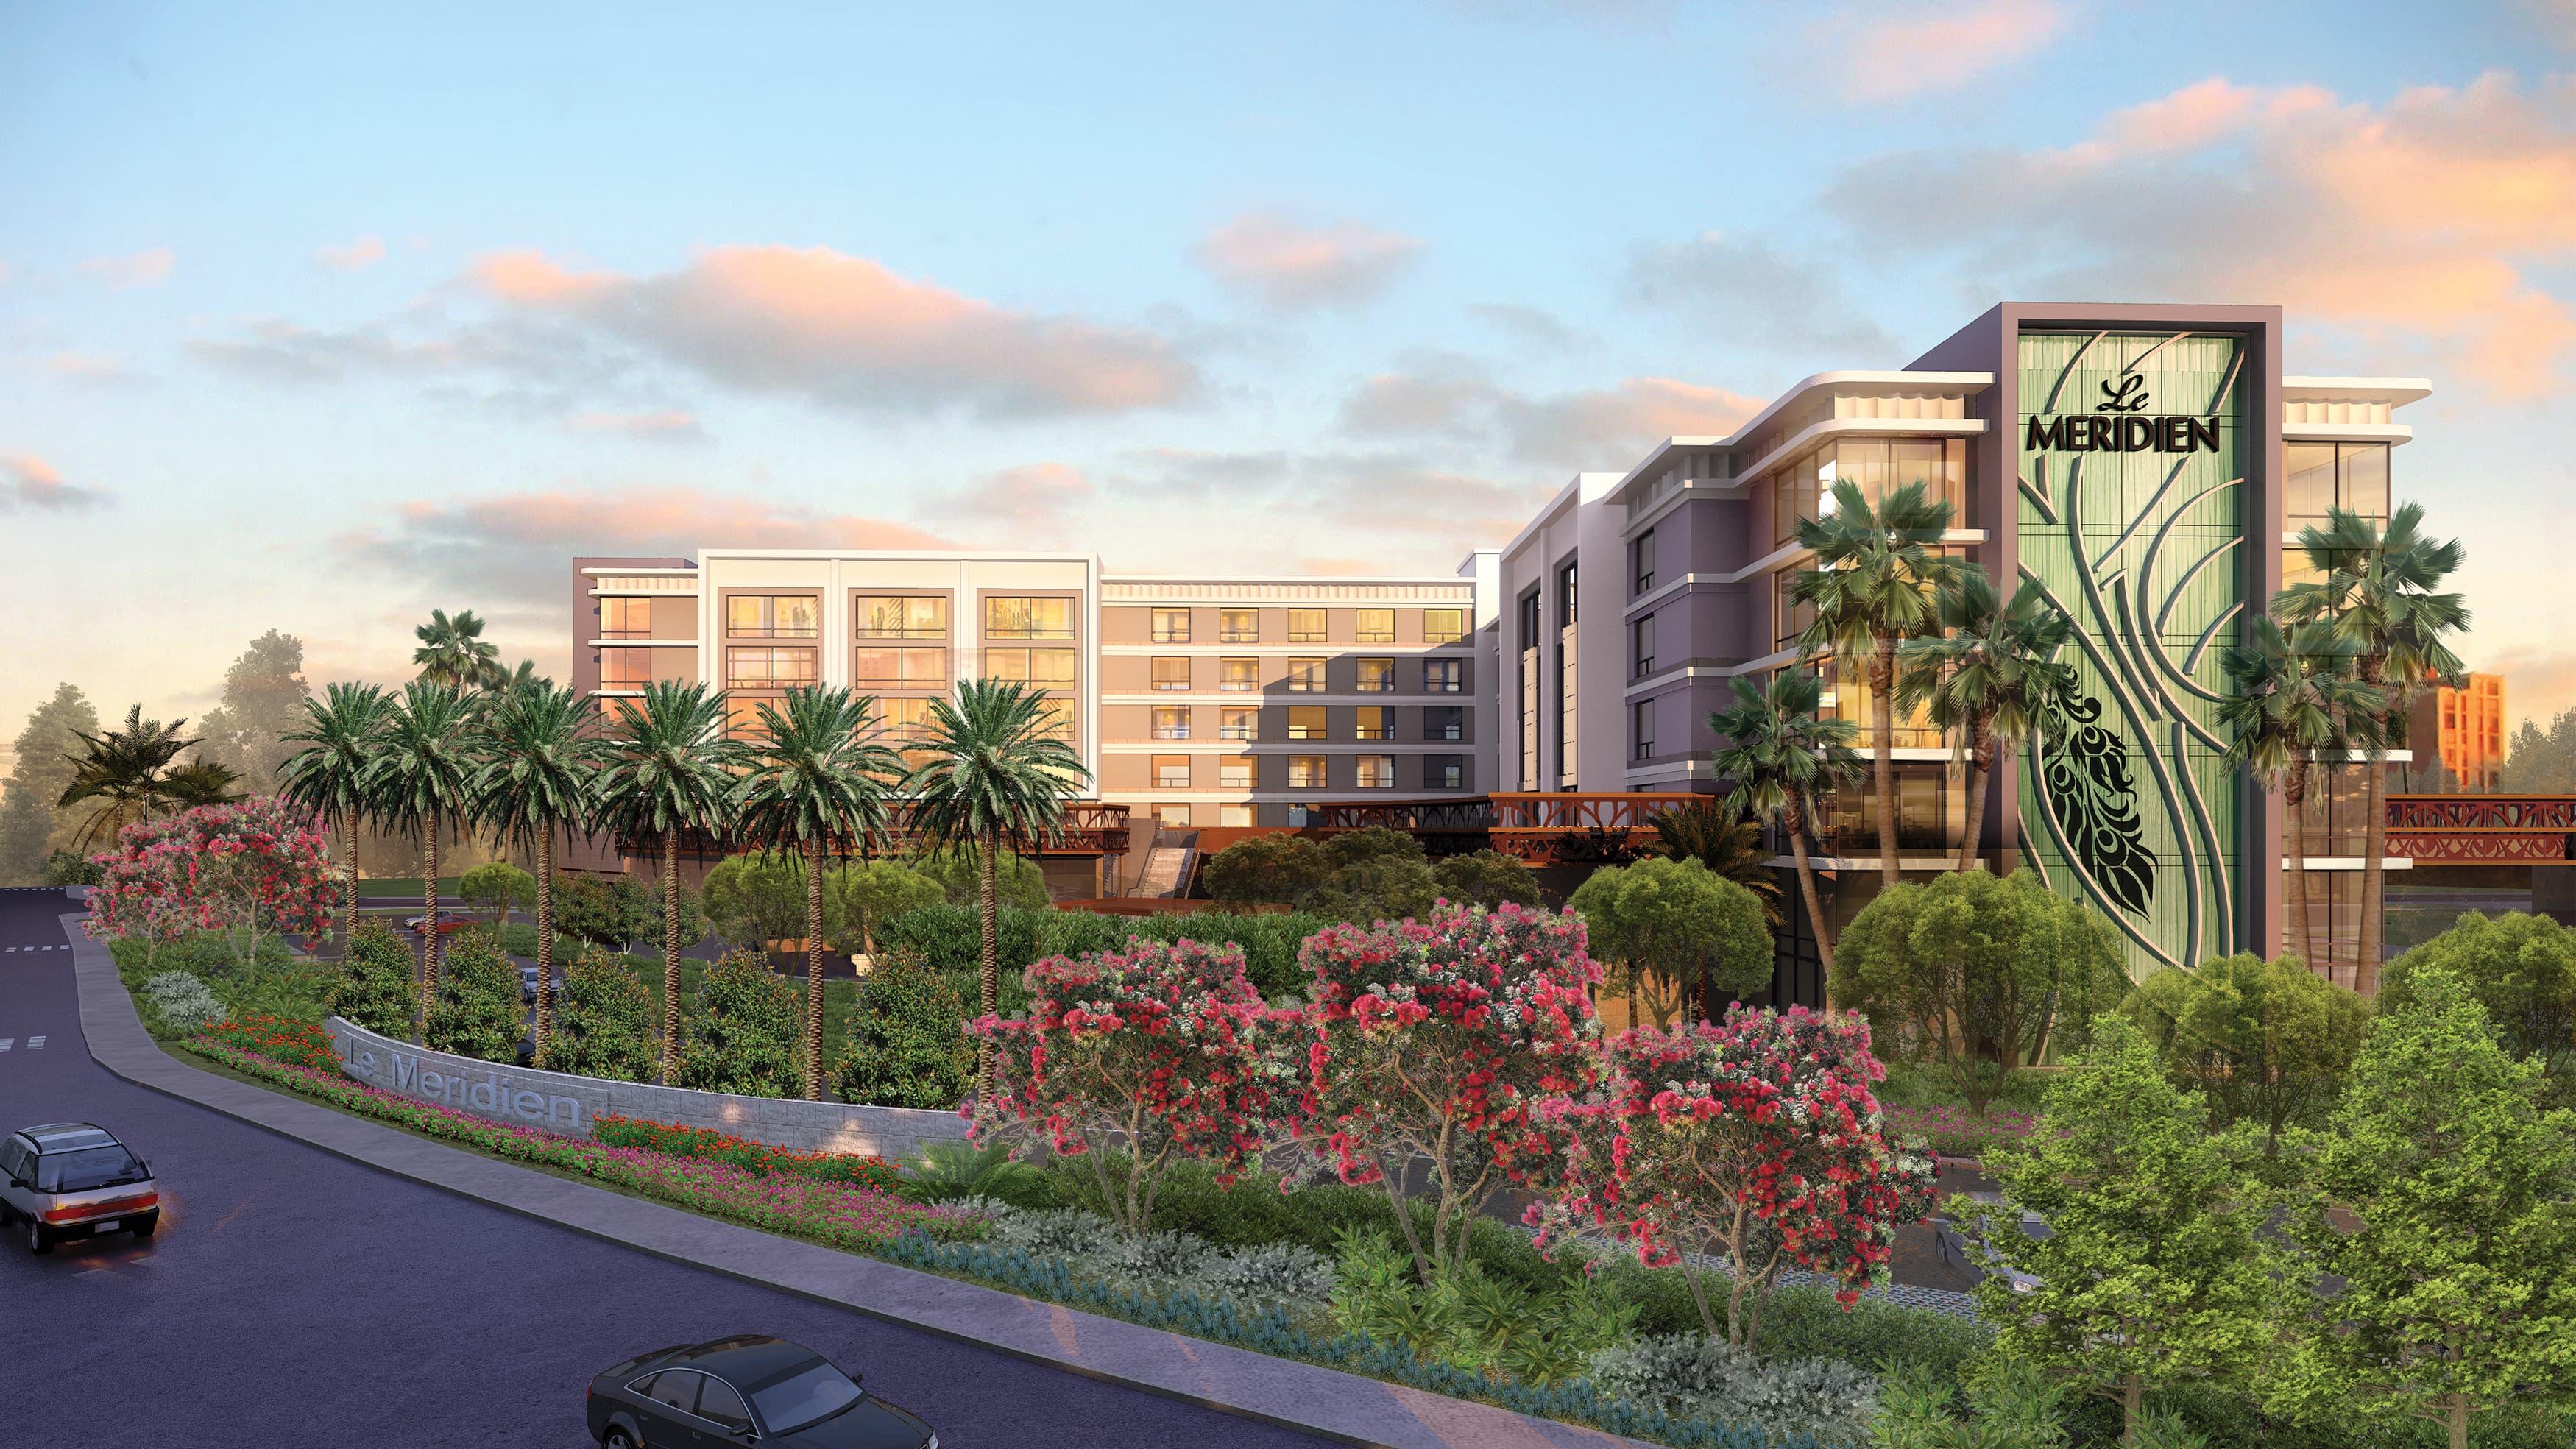 Le Meridien, a four star destination hotel, sits adjacent to the Santa Anita Race track in Arcadia California.